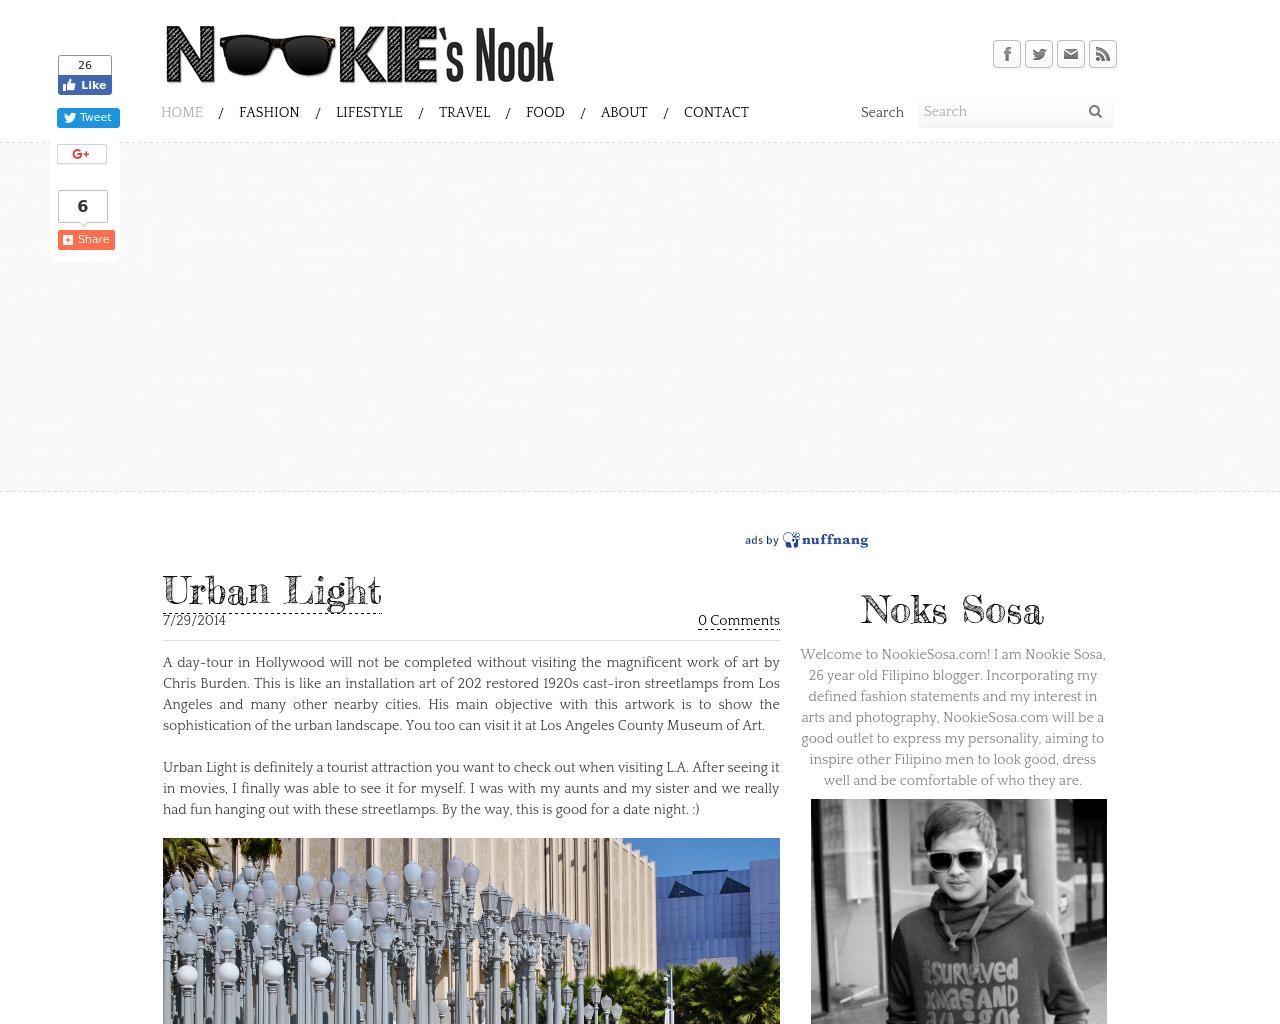 Nookie's-Nook-Advertising-Reviews-Pricing